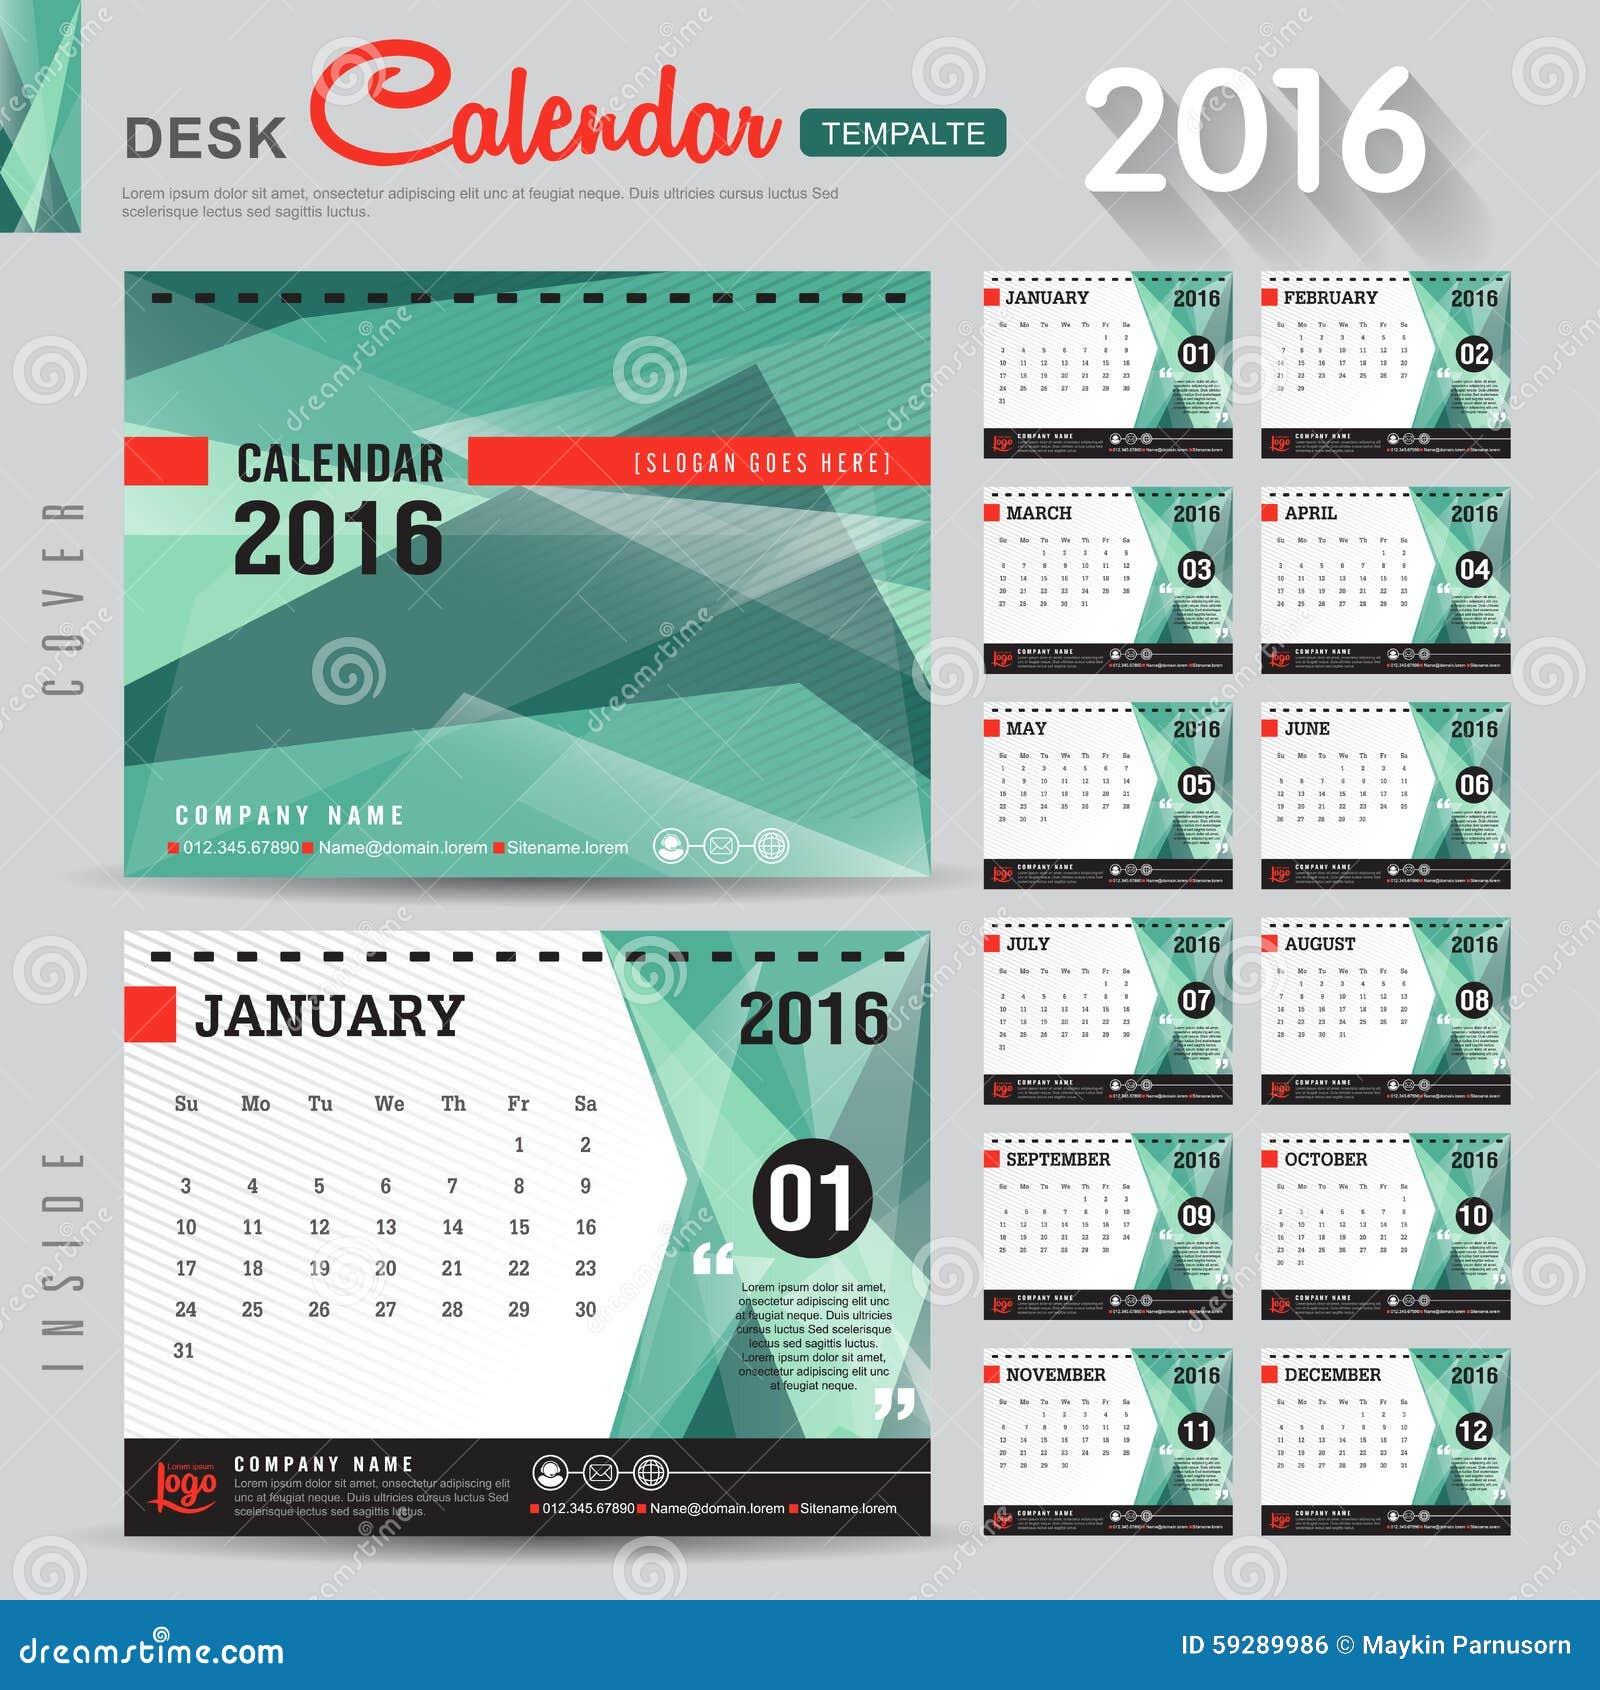 Calendar Design Eps : Calendar stock vector image of company august